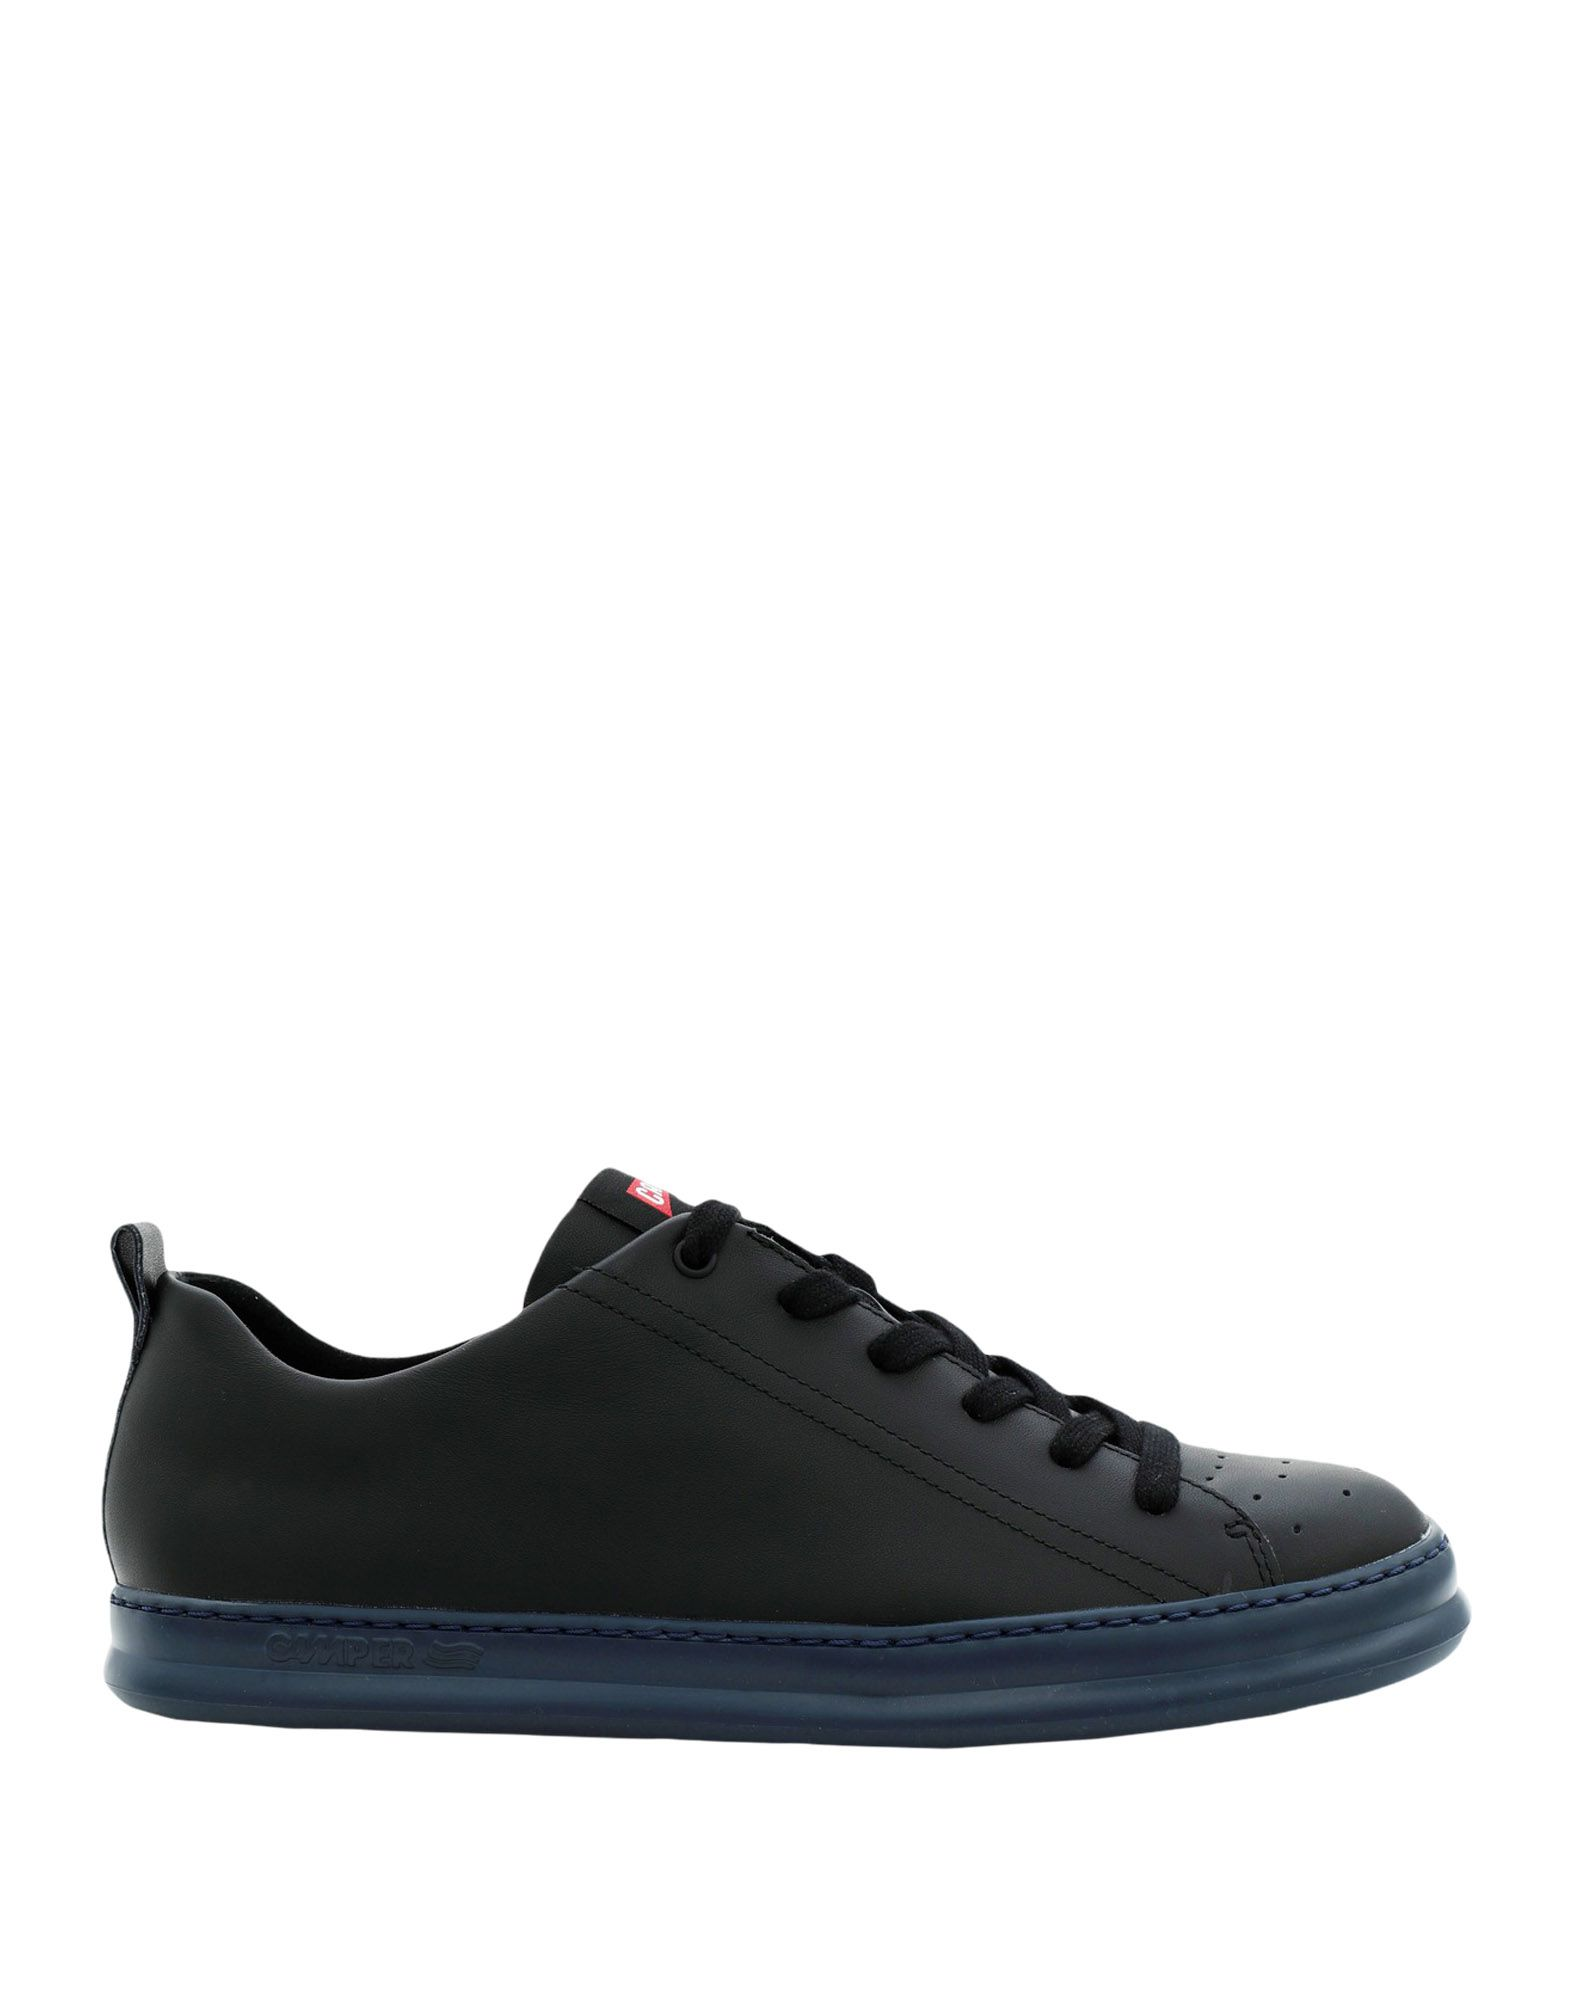 Camper Sneakers - Men Camper online Sneakers online Camper on  United Kingdom - 11555409GD 2b1105